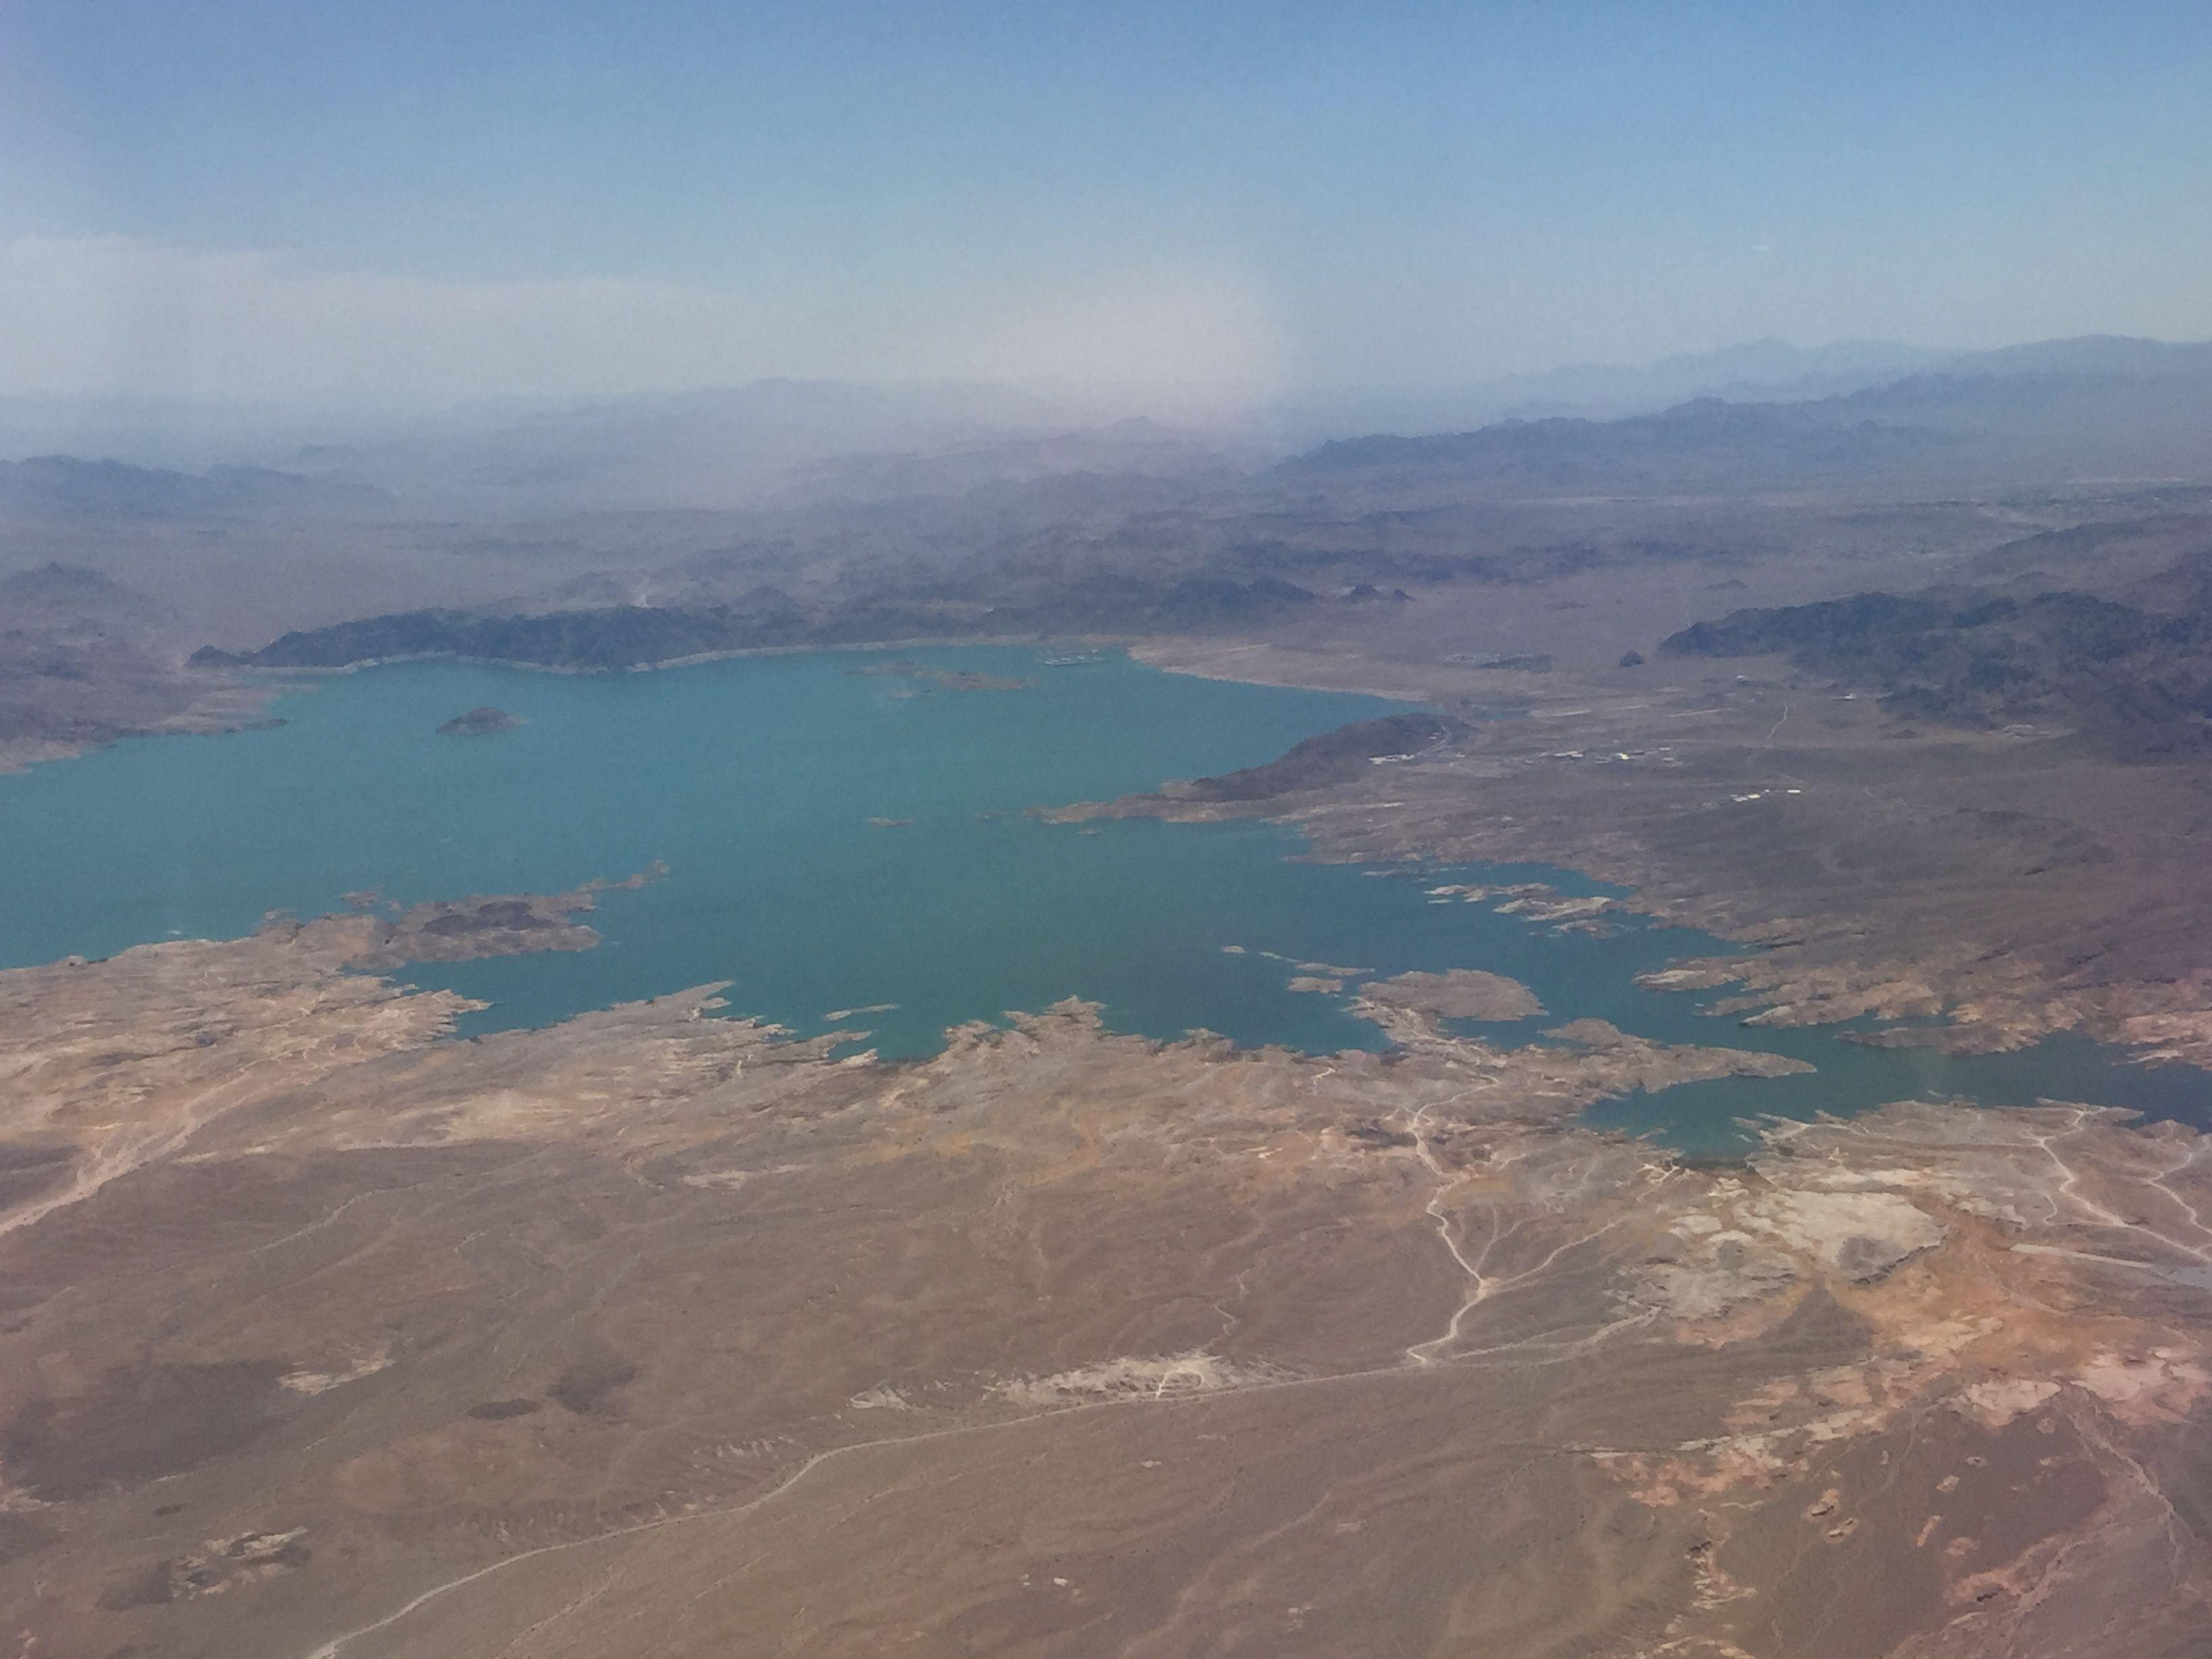 Lake mead lake mead airplane view lake